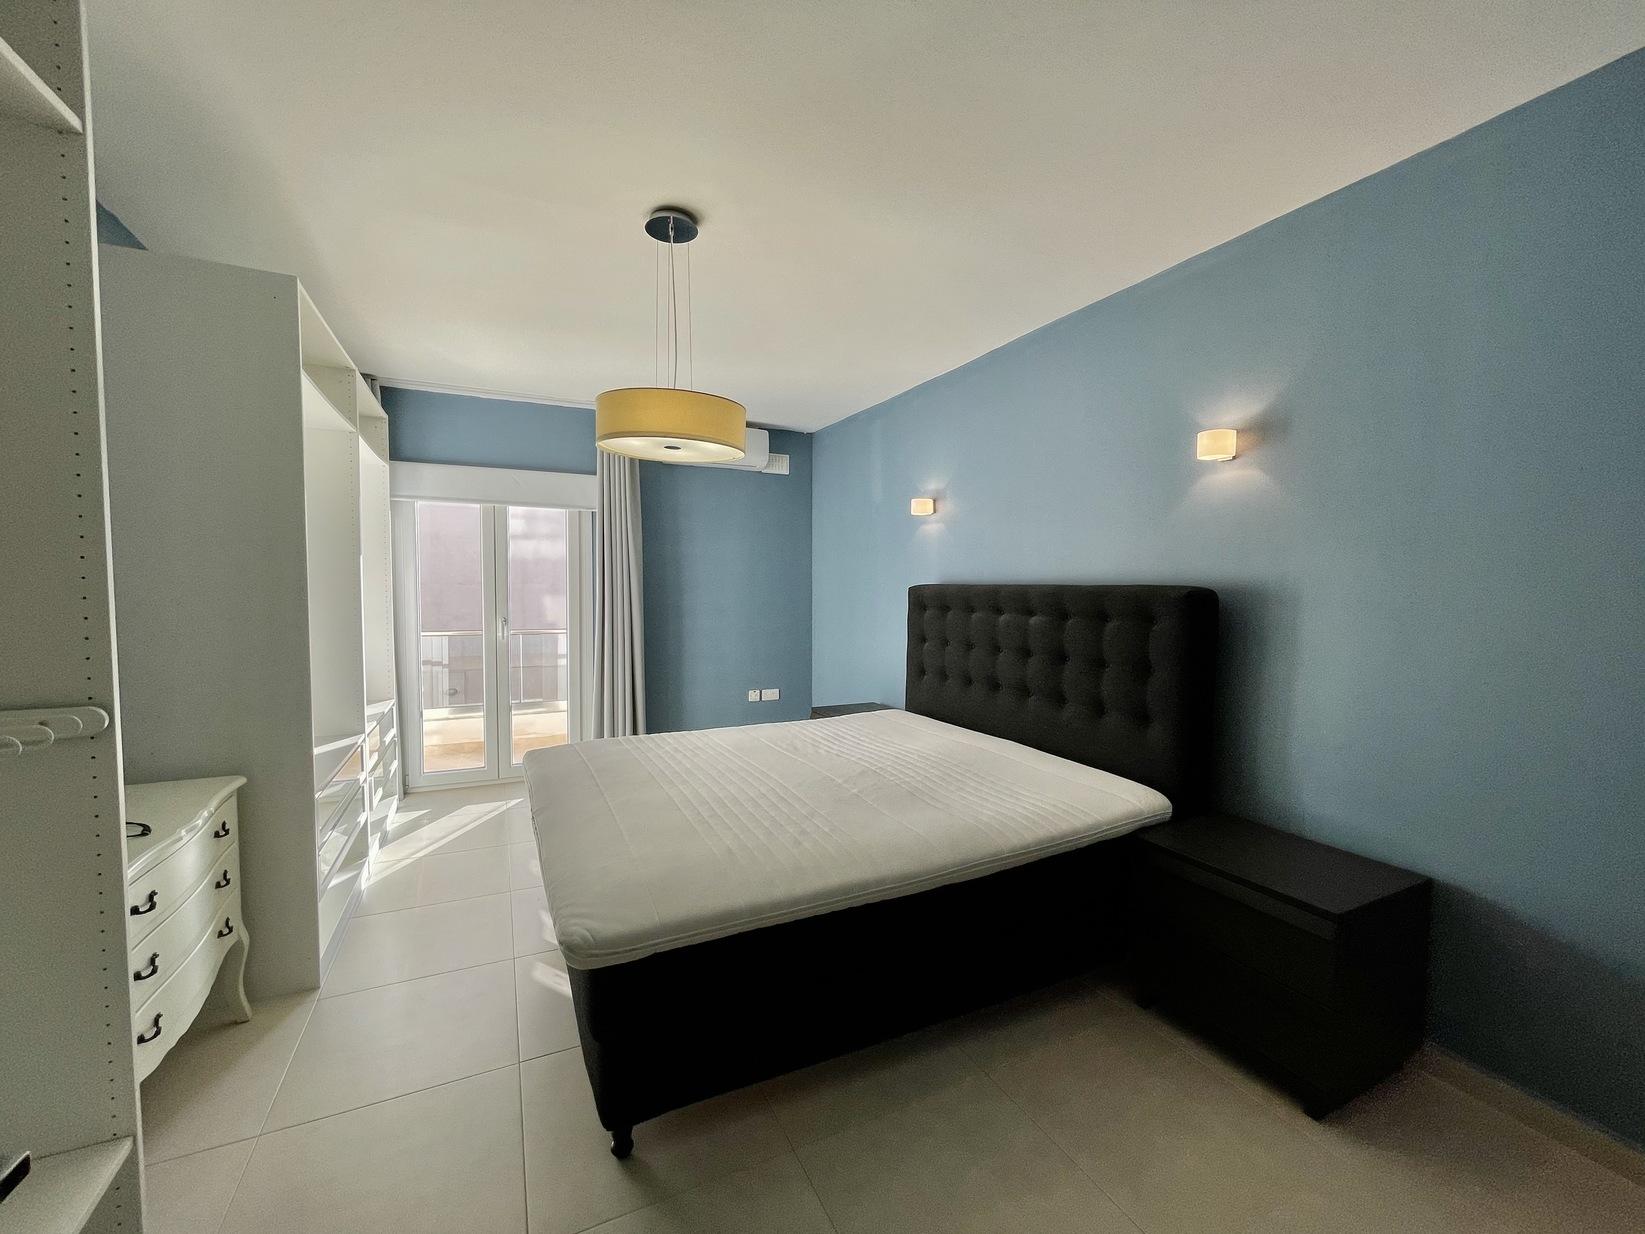 3 bed Apartment For Rent in Bahar Ic-Caghaq, Bahar ic-Caghaq - thumb 11